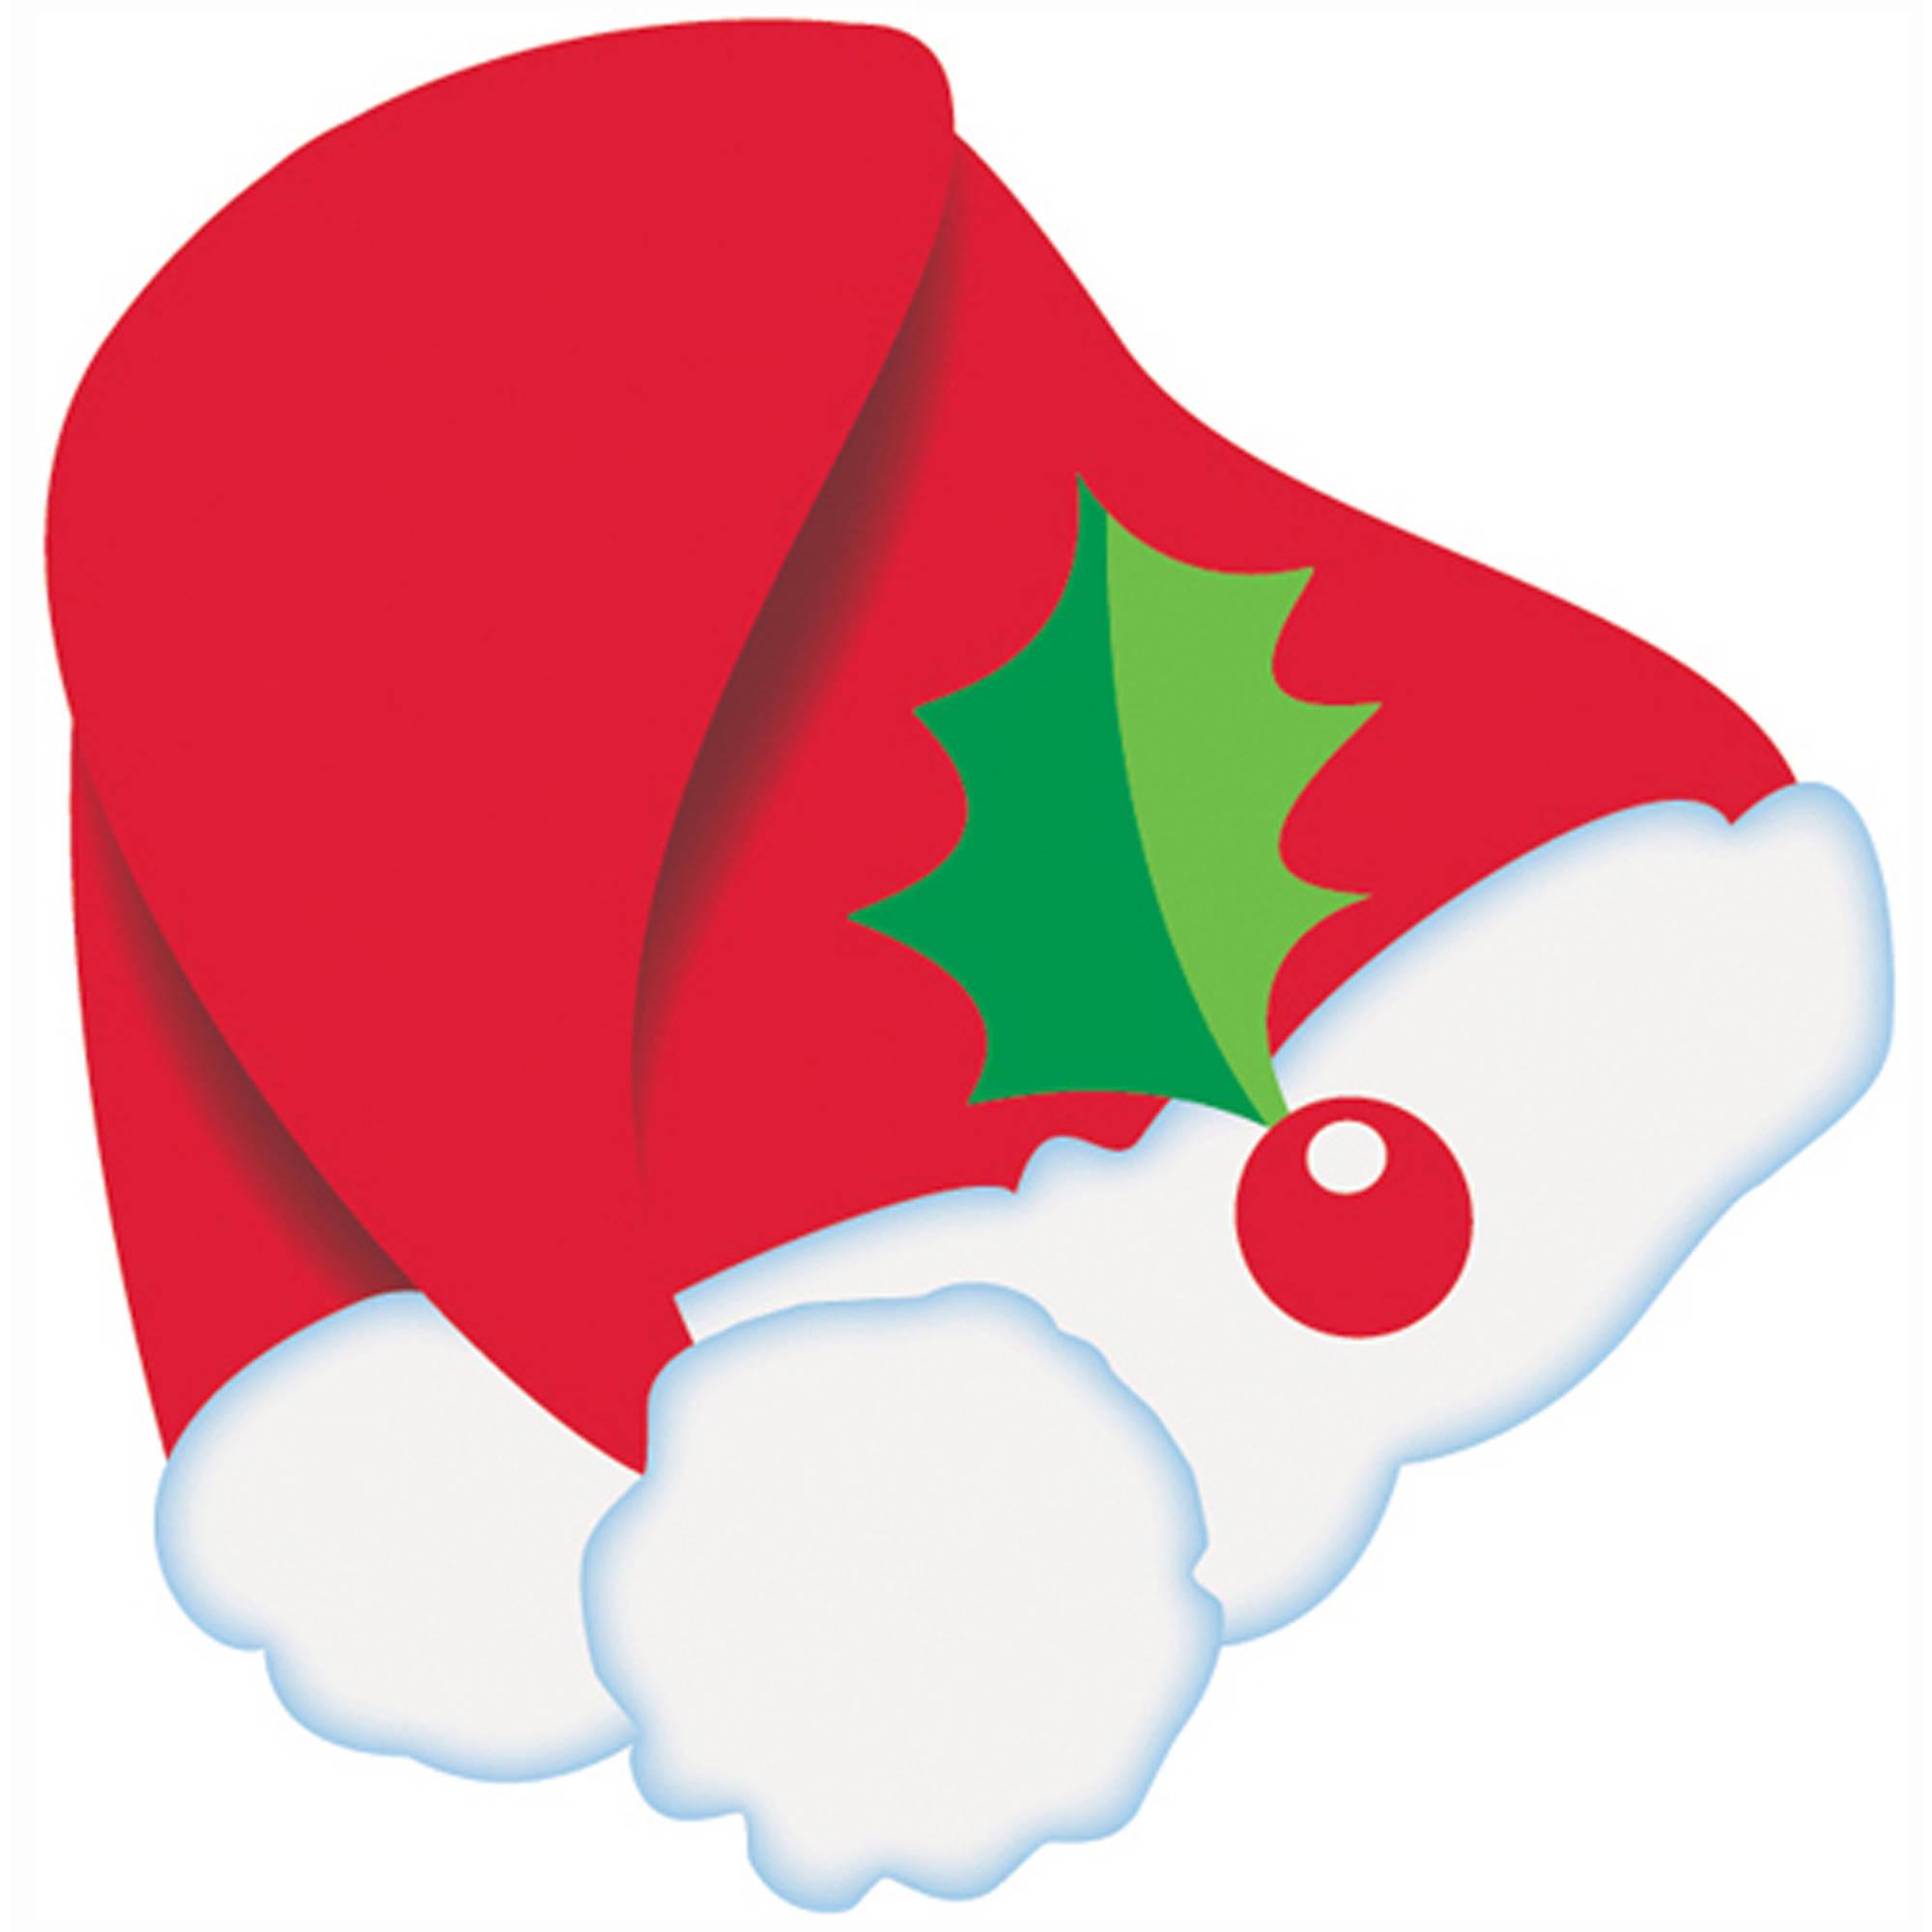 Walmart christmas clipart png transparent download Paper Confetti Cut Out Christmas Decorations, 24-Count png transparent download